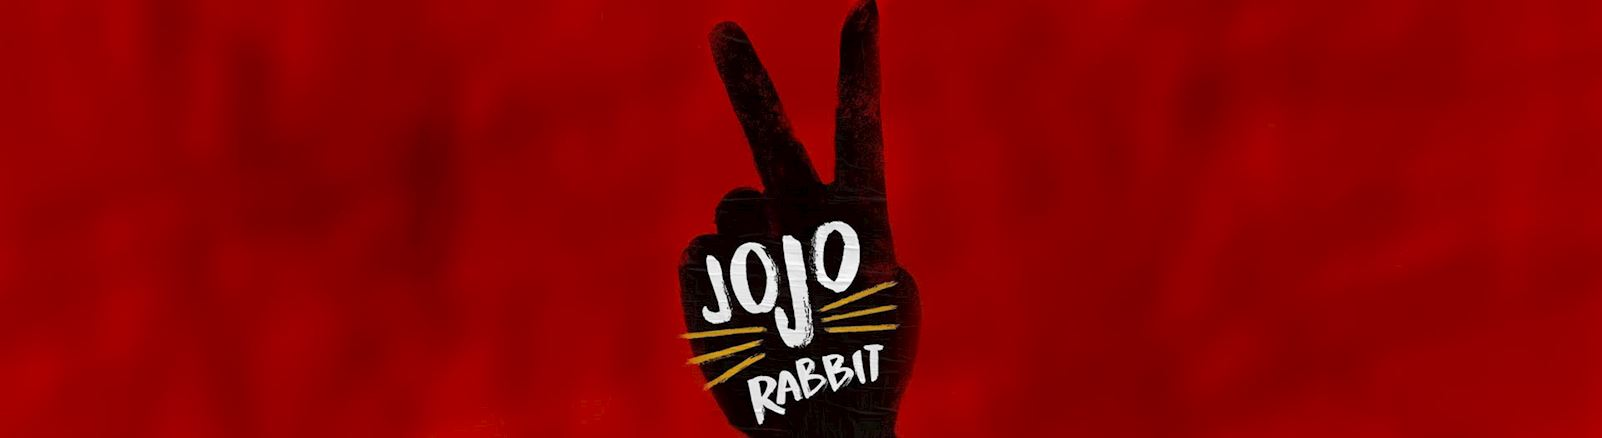 <h3>Jojo Rabbit</h3>